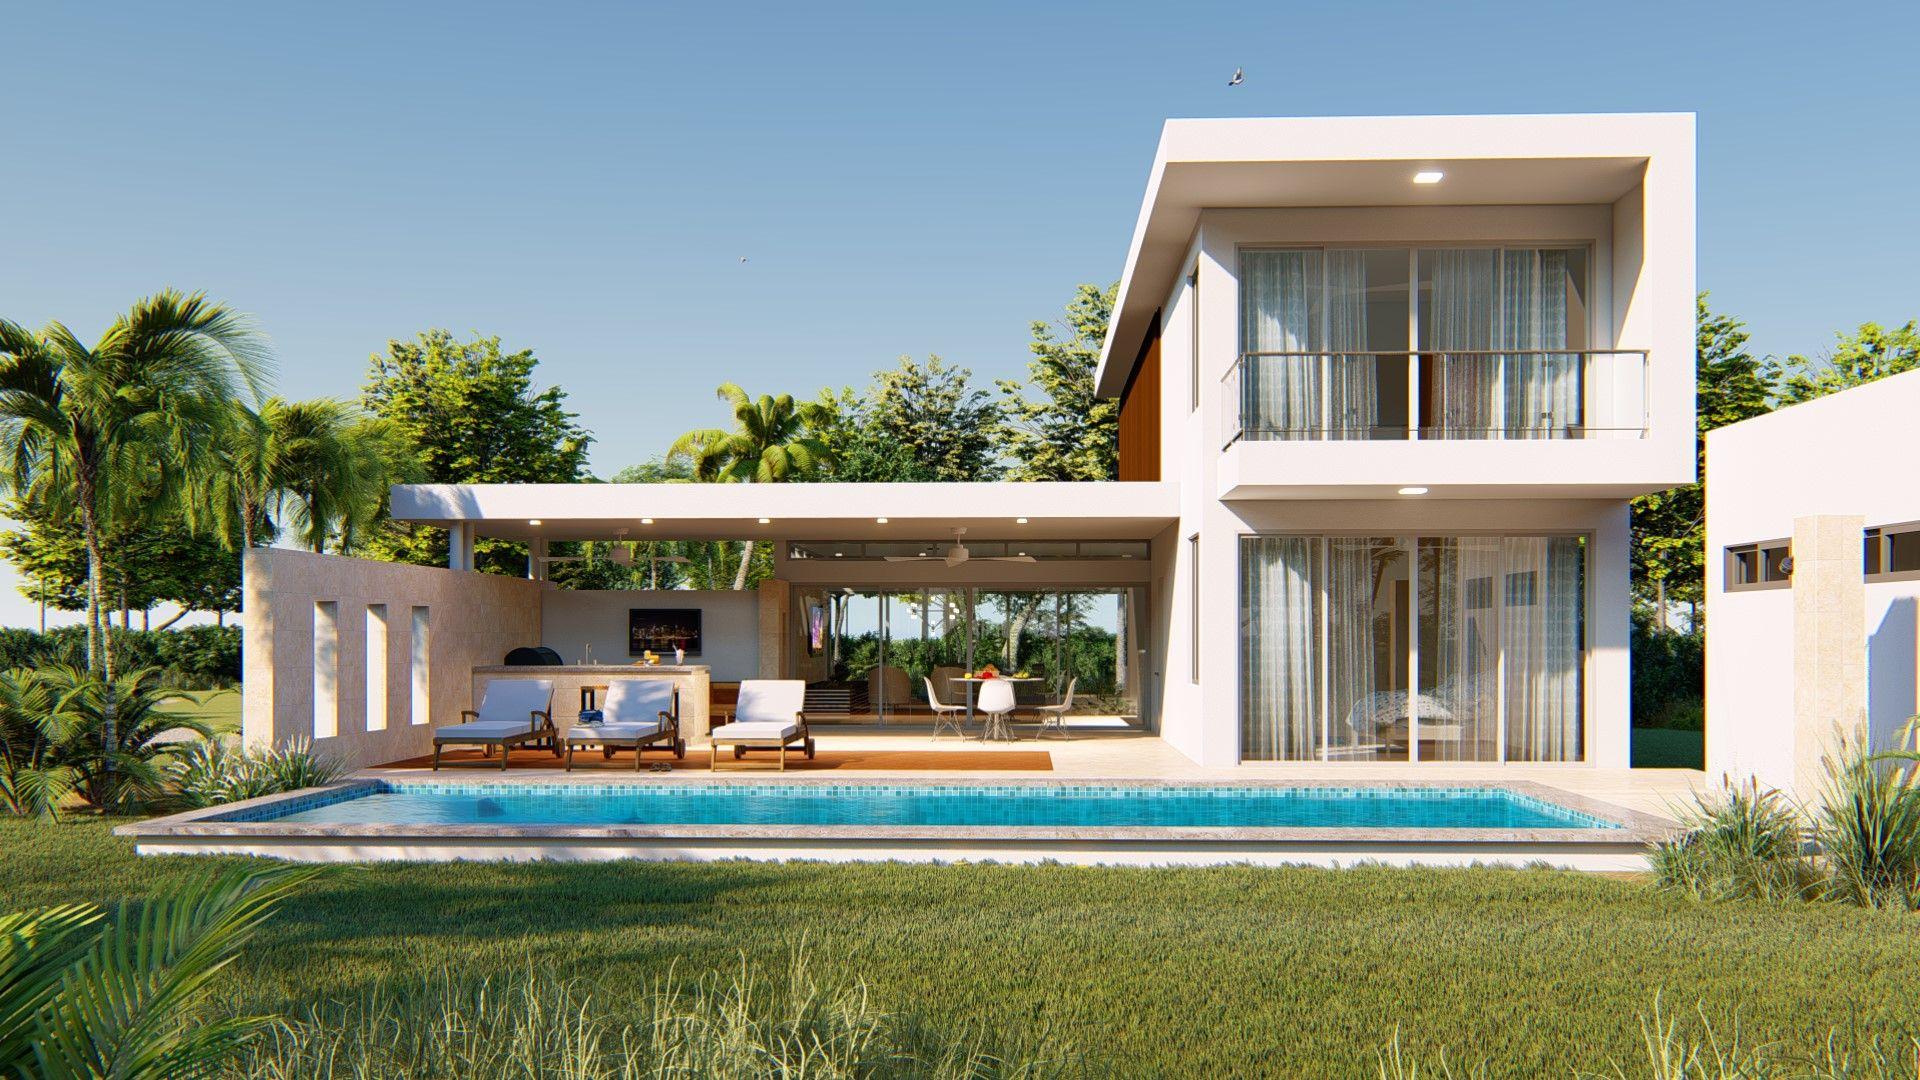 Villa Wave, rendered in Lumion 8 by Reynaldo Acevedo